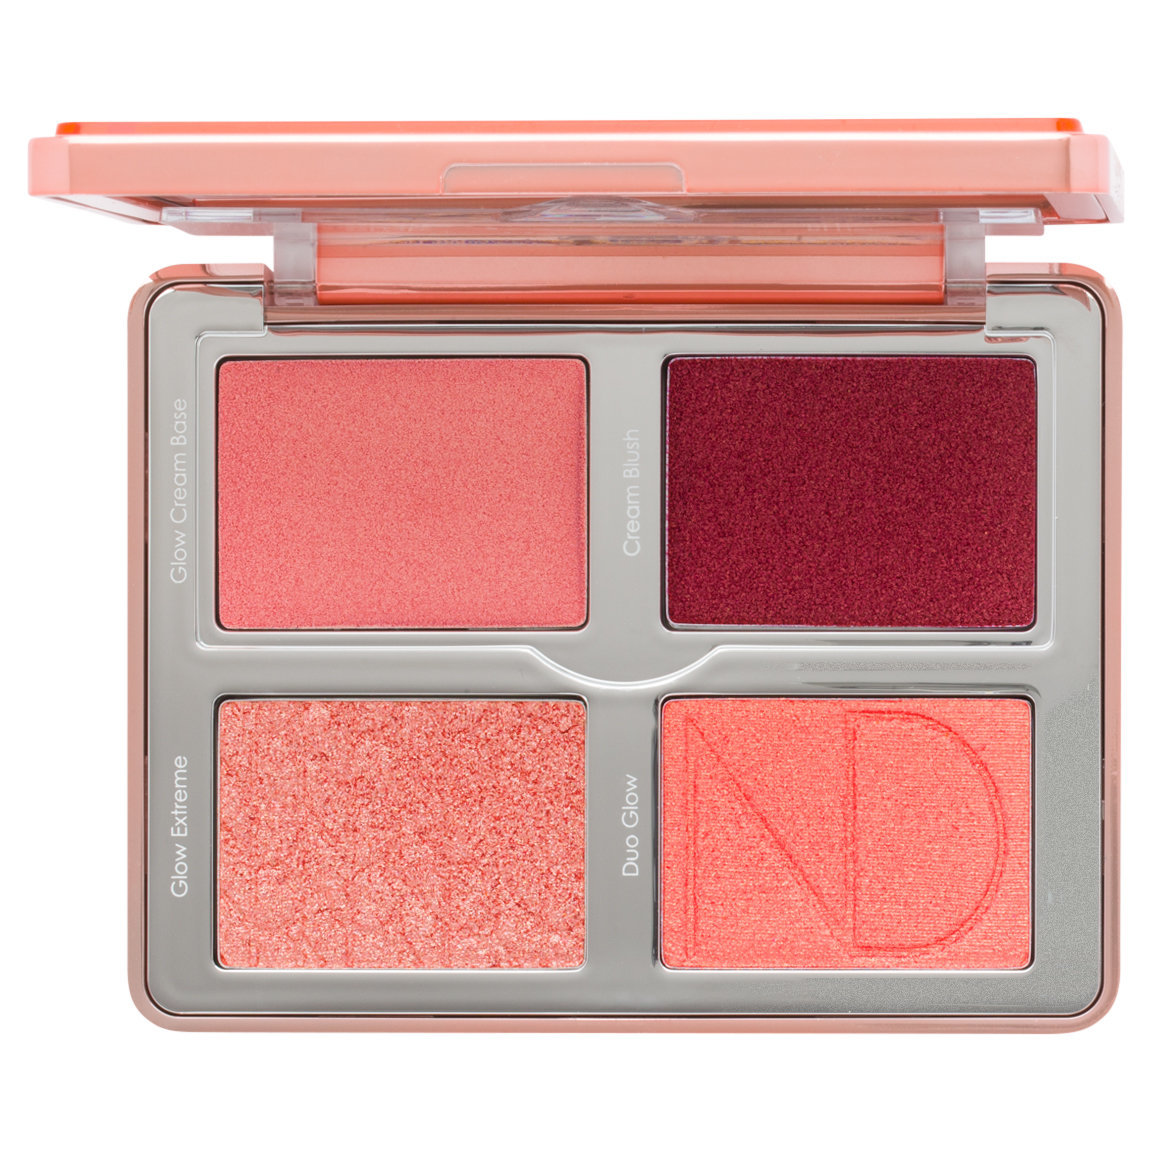 Natasha Denona Bloom Blush & Glow Palette product swatch.